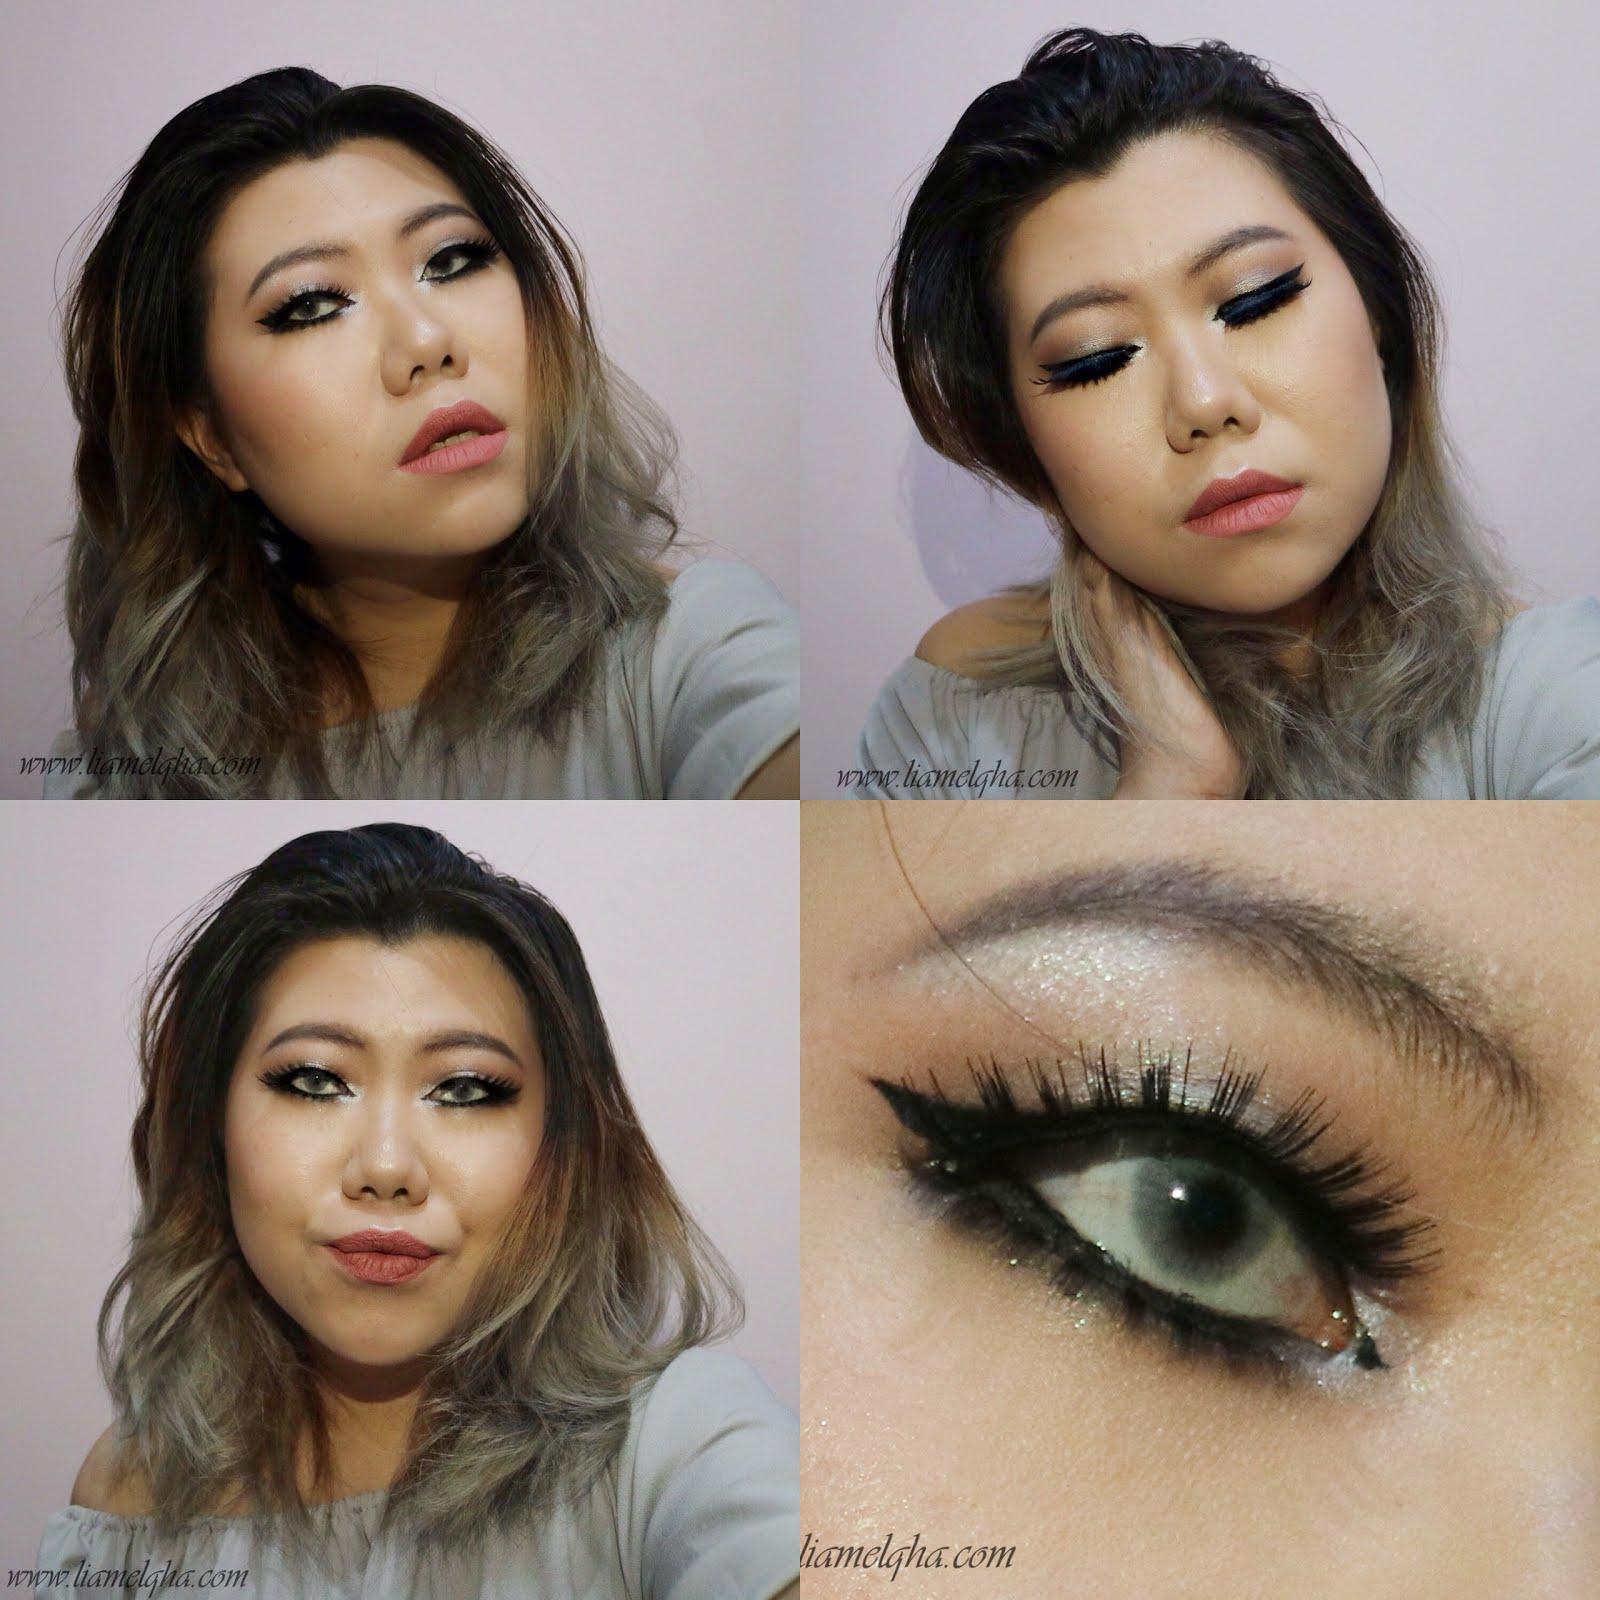 Kedua aku menggunakan riasan mata yang identik dengan dolly look Untuk kelopak mata atas aku menggunakan warna pink dan putih